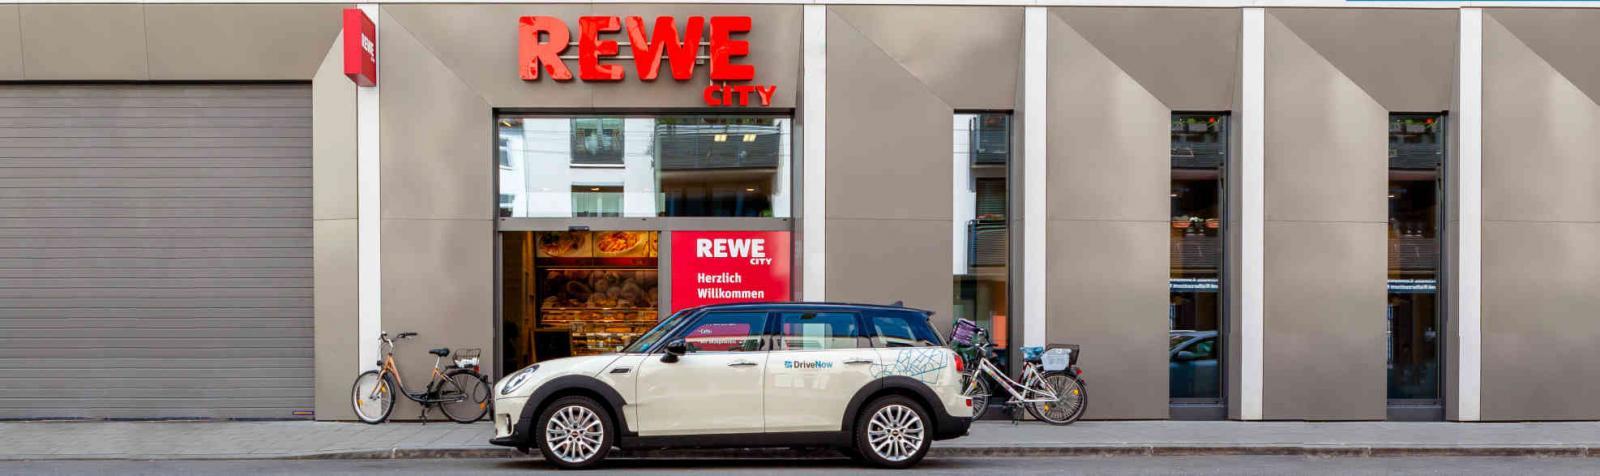 rewe-sparen-drivenow-carsharing